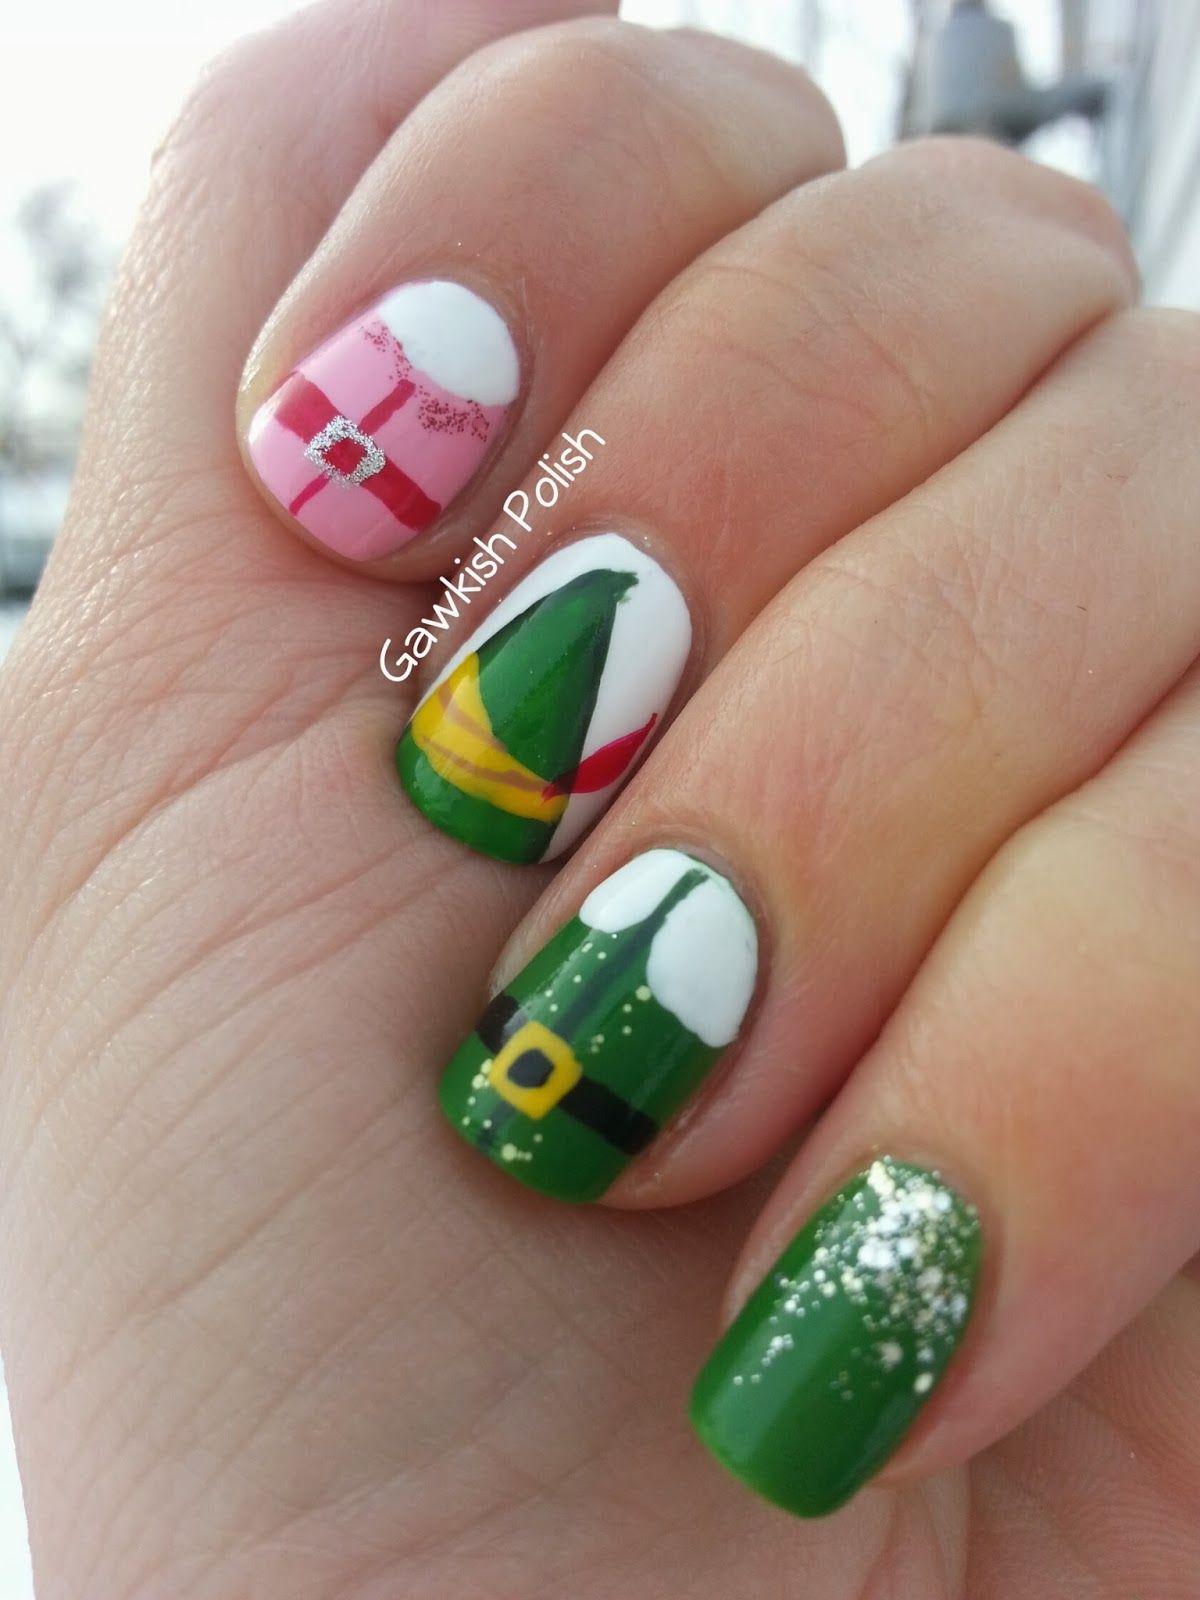 Elf Movie Nail Art, Gawkish Polish. Christmas nails in 2019